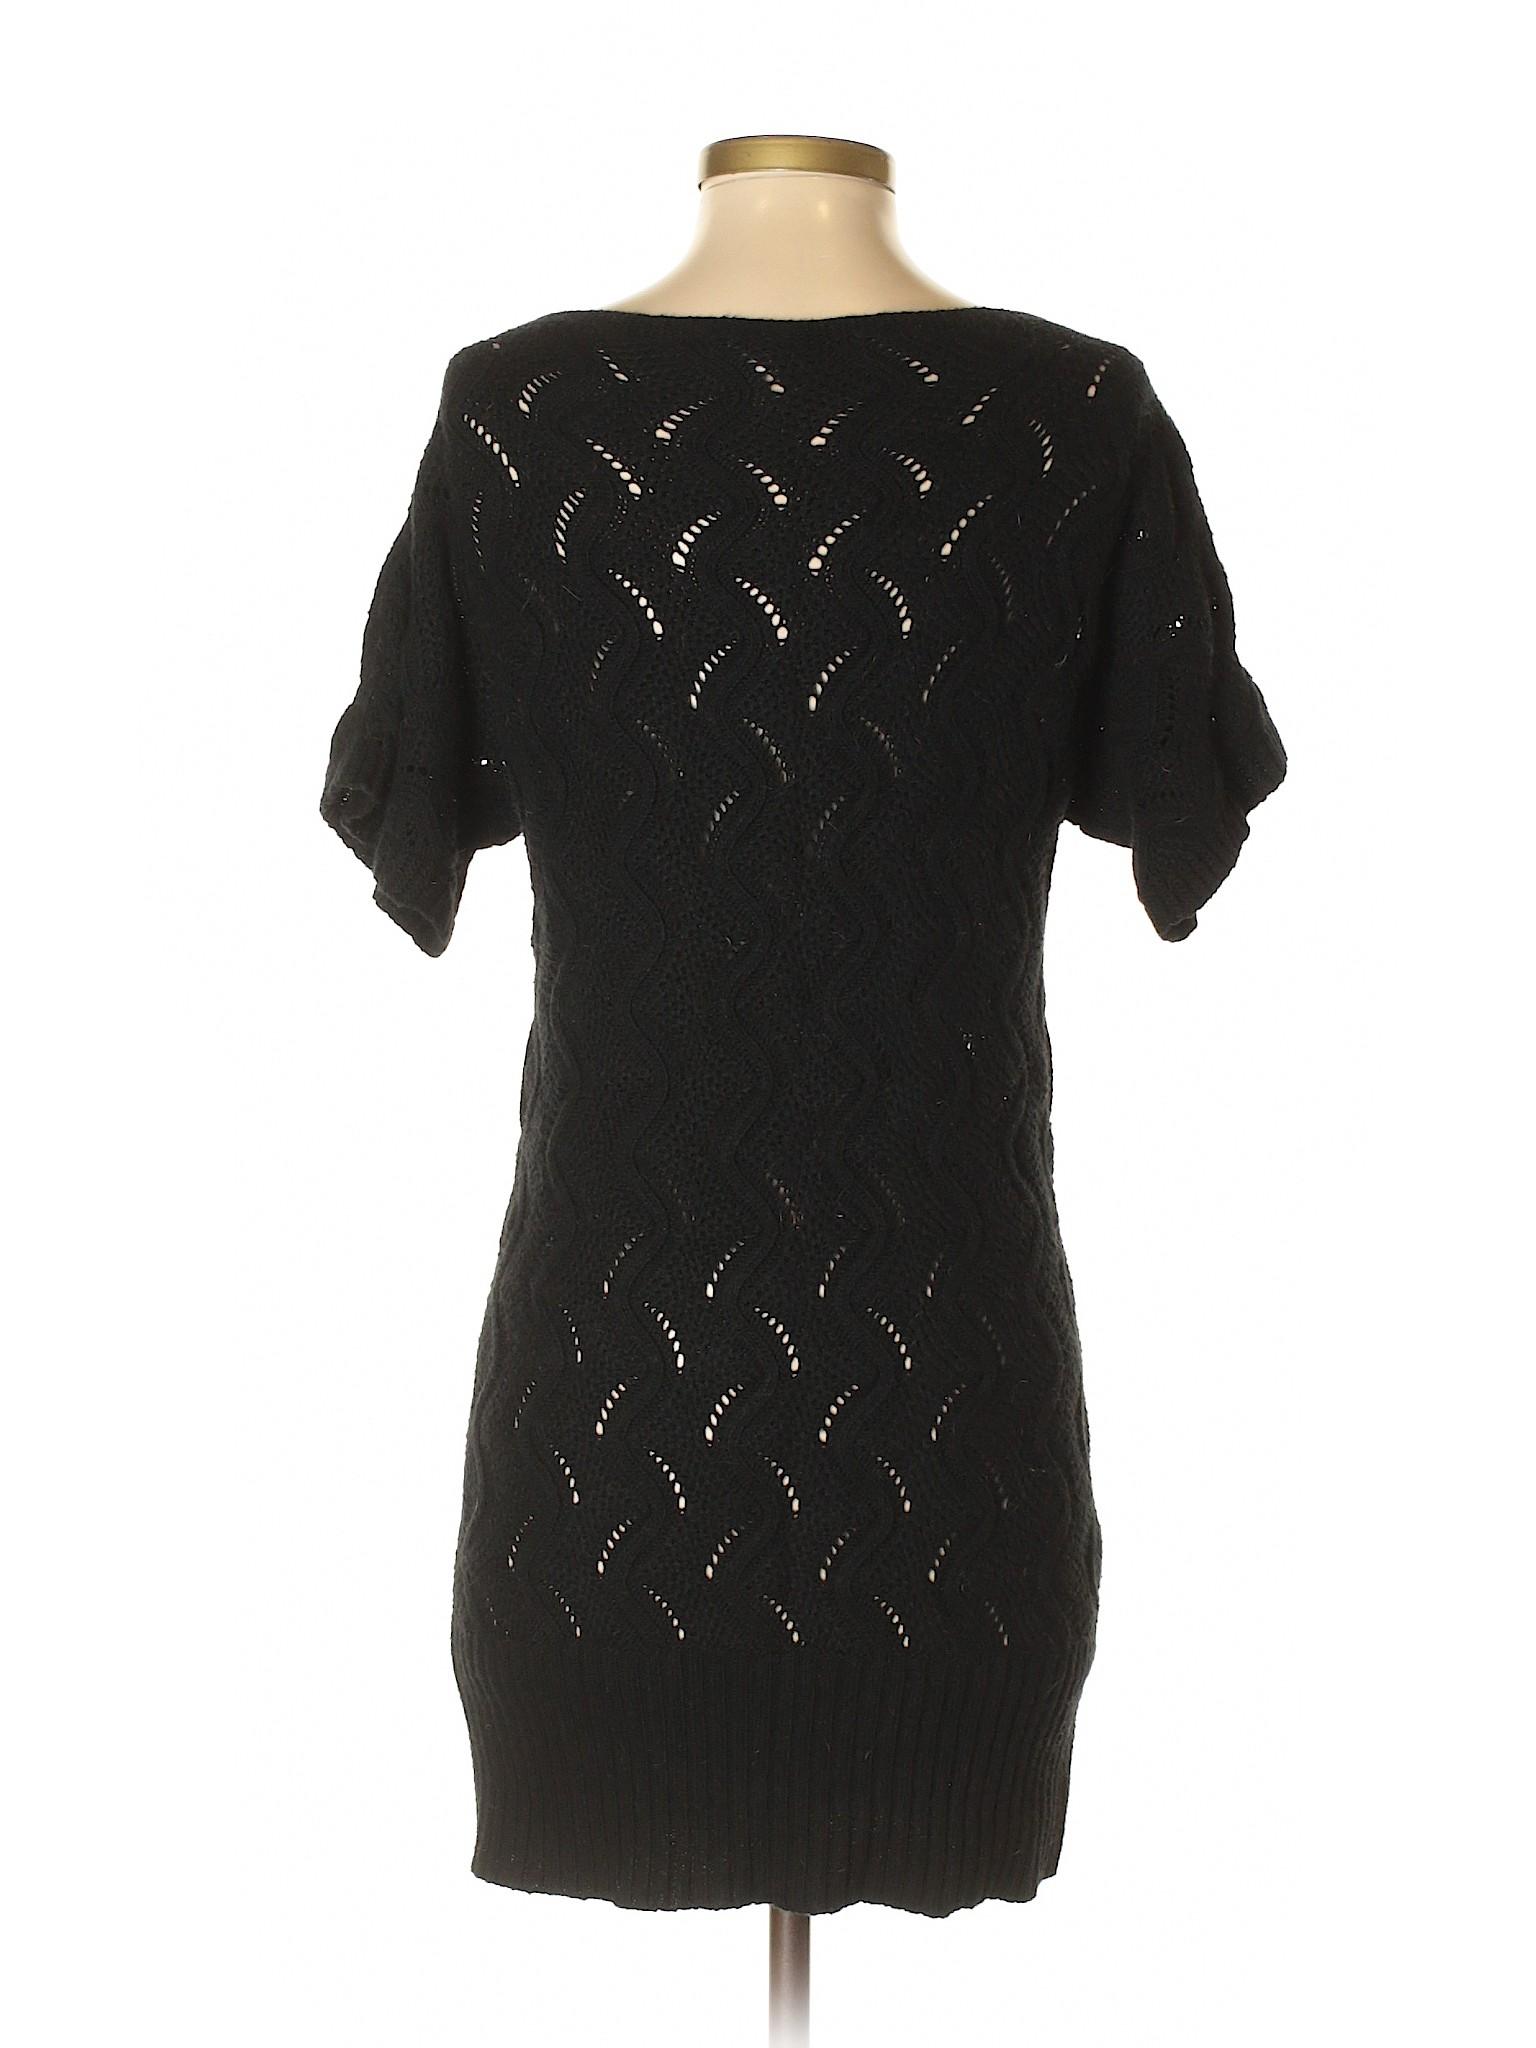 DownEast Selling Selling DownEast Dress Selling DownEast Basics Casual Casual Dress Basics wSOSHq